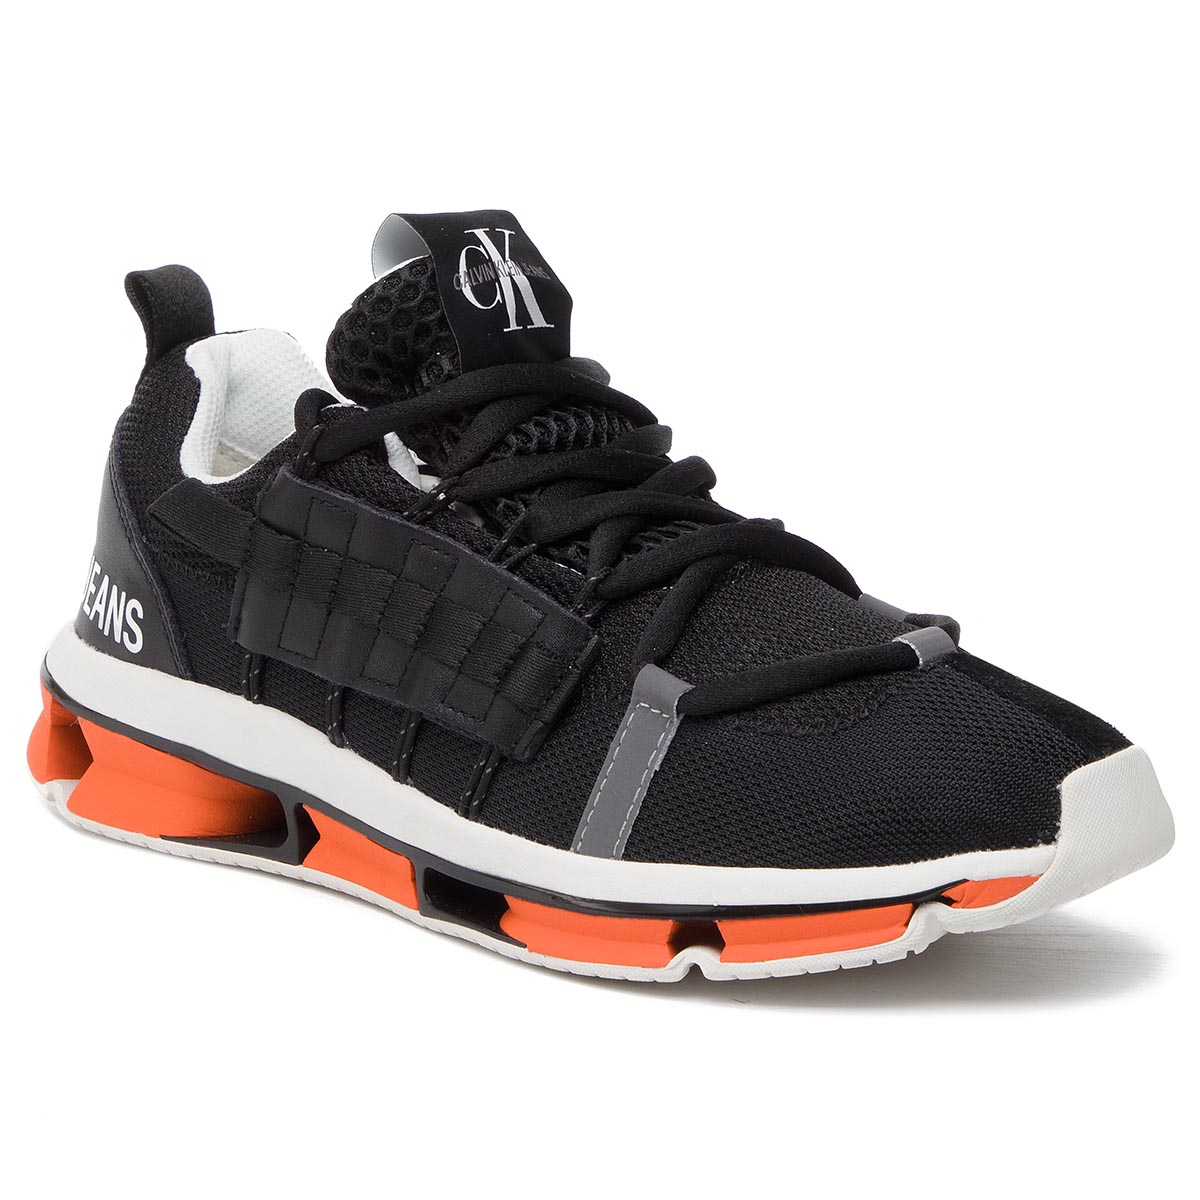 Image of Sneakers CALVIN KLEIN JEANS - Lex S0589 Black